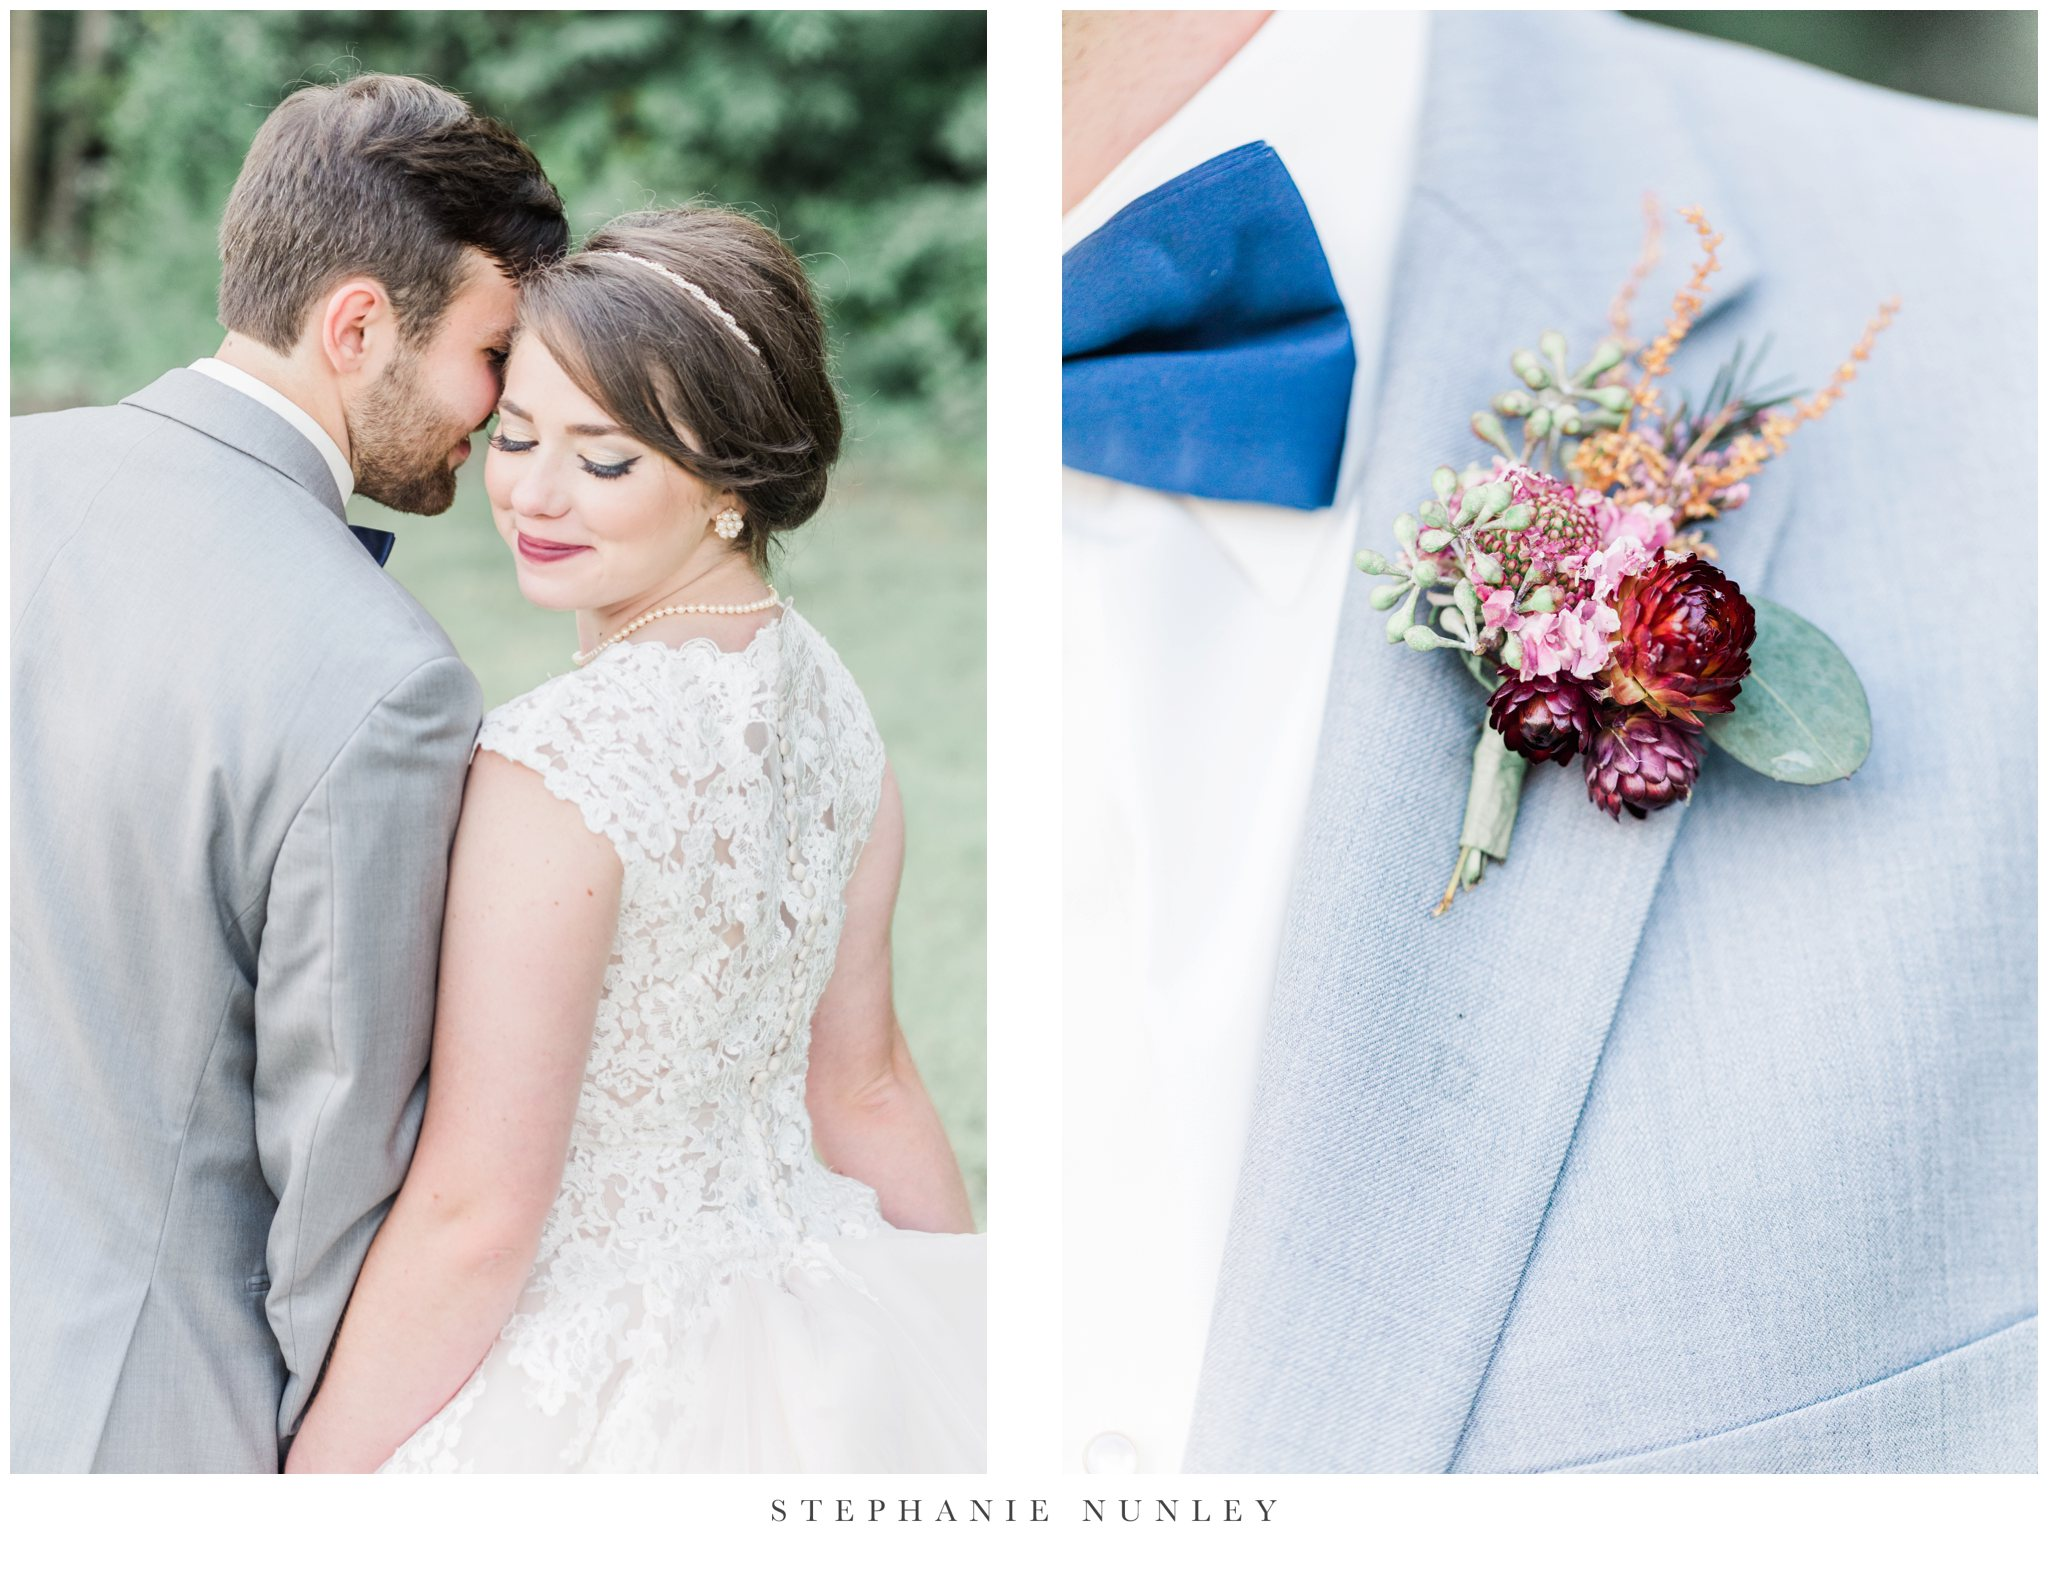 arkansas-wedding-with-lush-wildflower-bouquet-0134.jpg